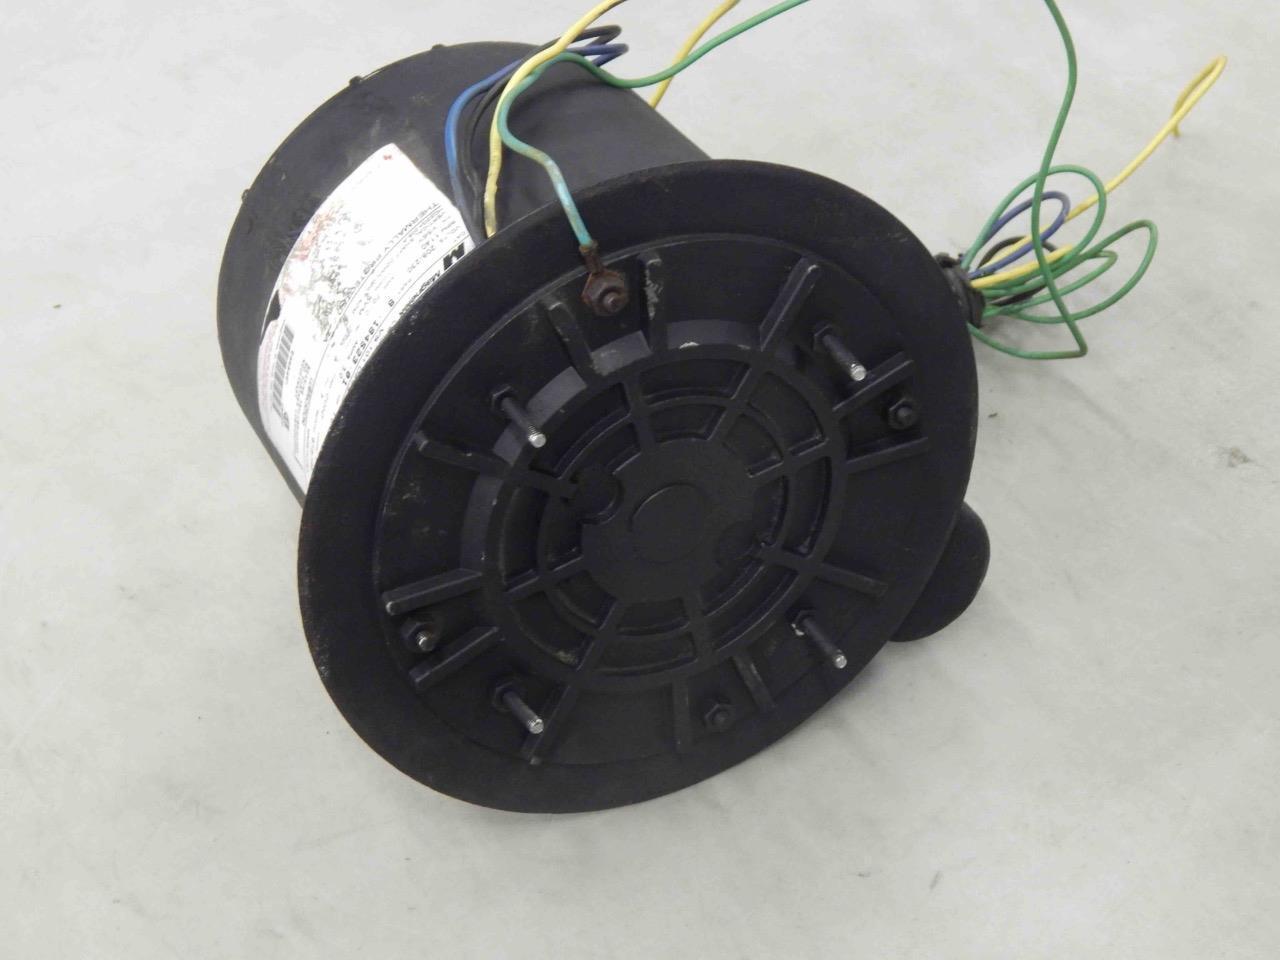 #2 Magnetek Century AC Motor 8-184523-01 1-HP 208-230V 1140-RPM Y56Y Fr 3-Ph